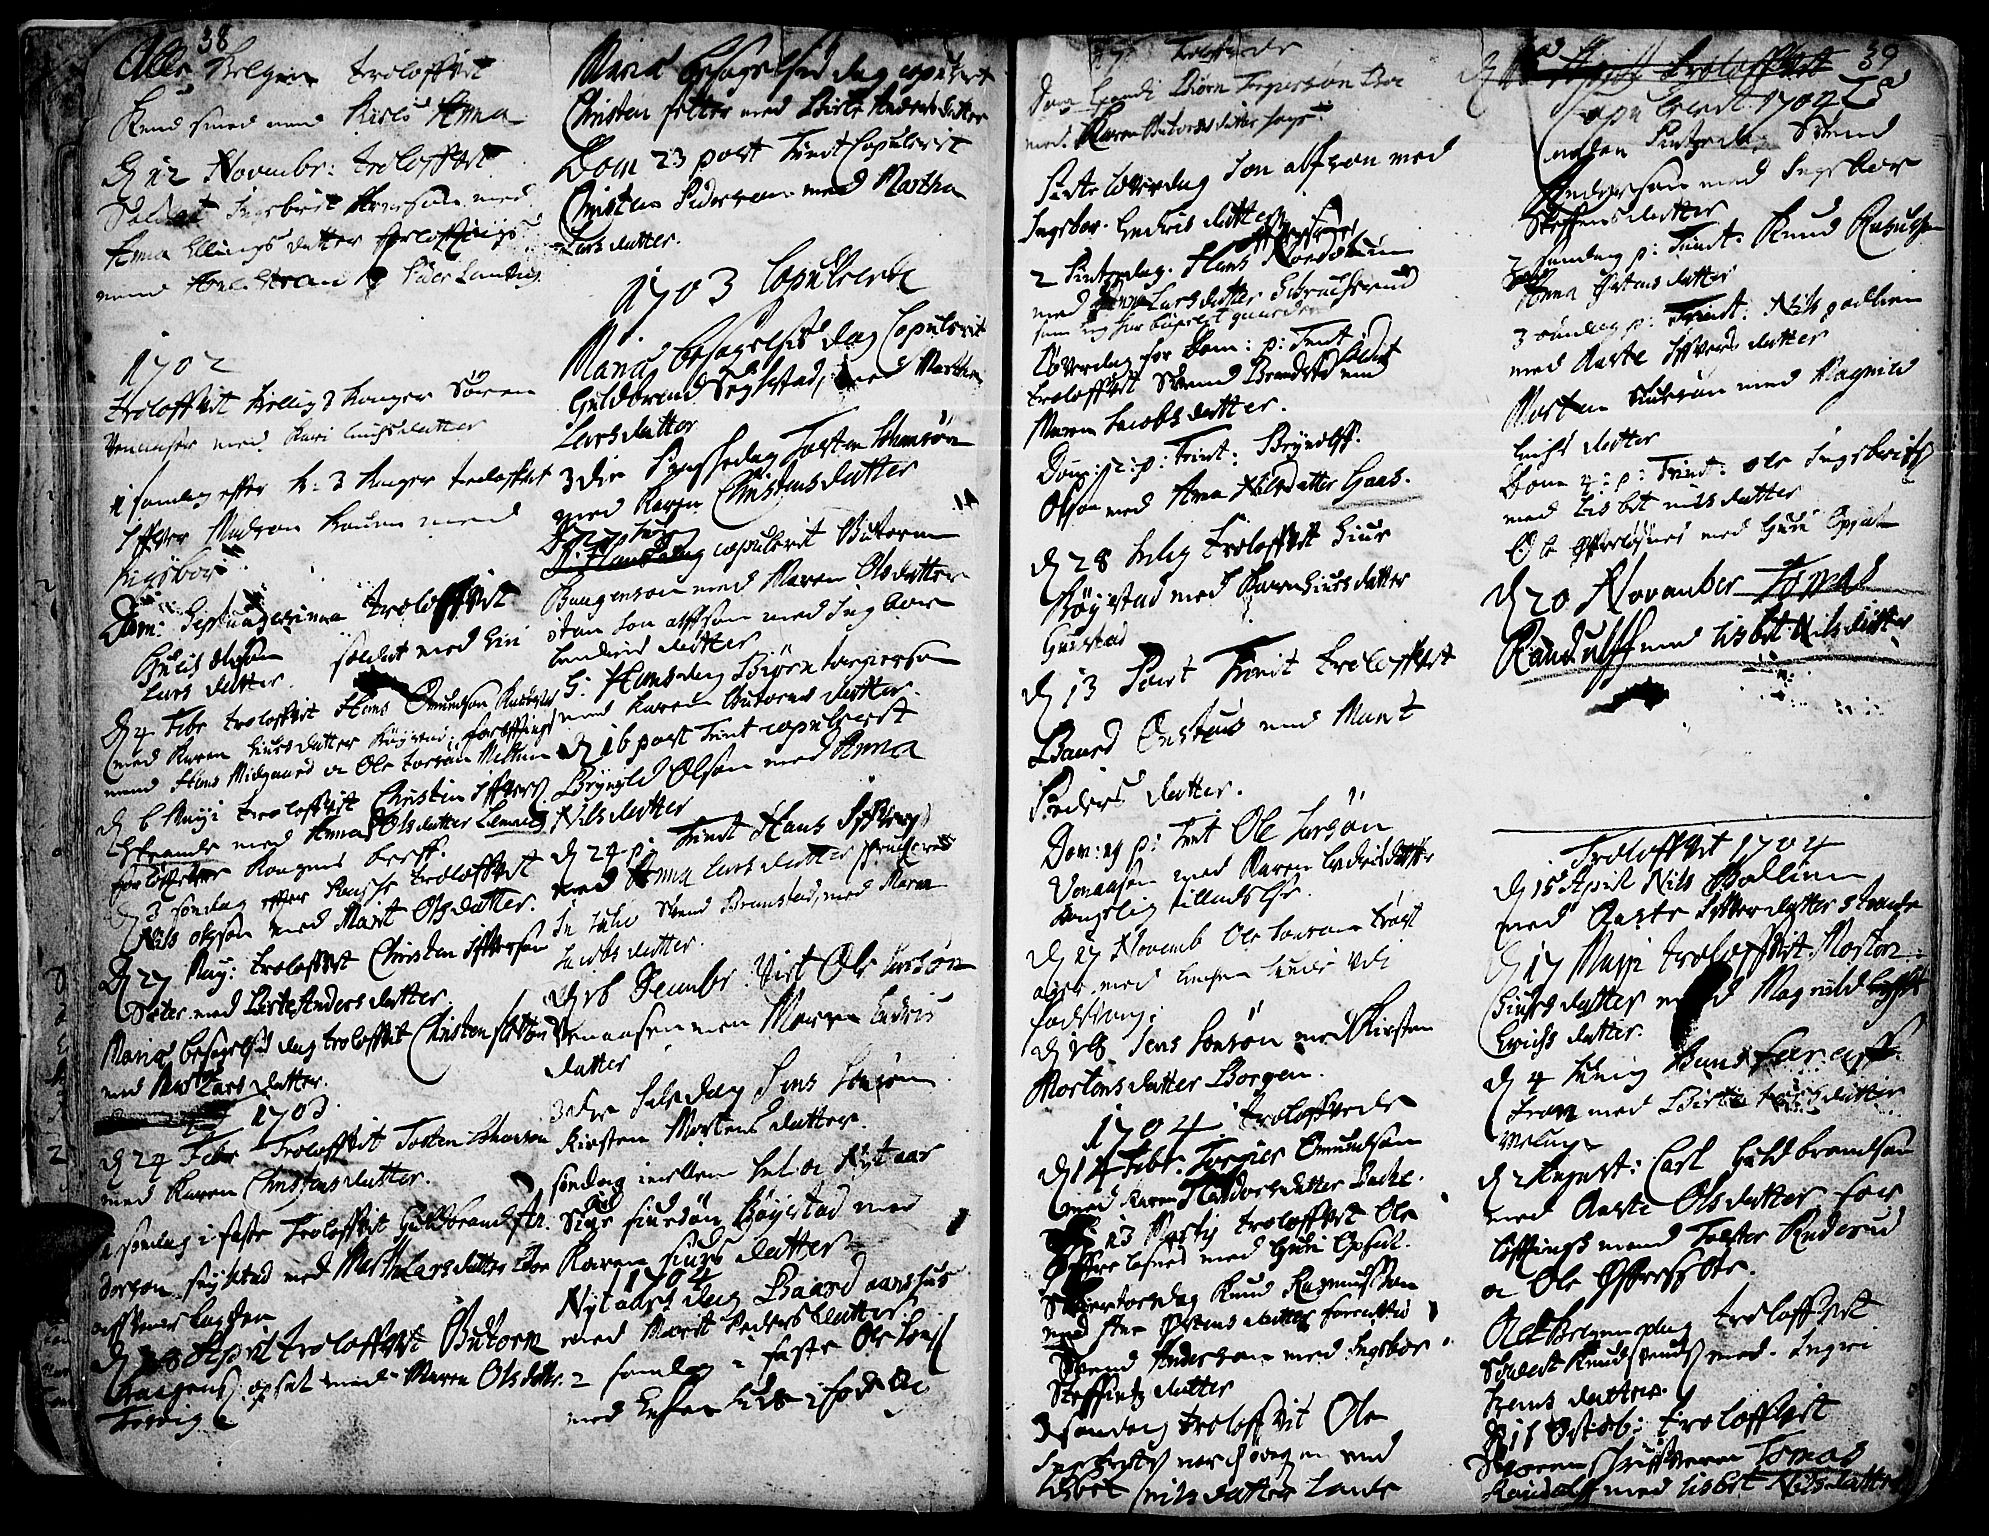 SAH, Ringebu prestekontor, Ministerialbok nr. 1, 1696-1733, s. 38-39